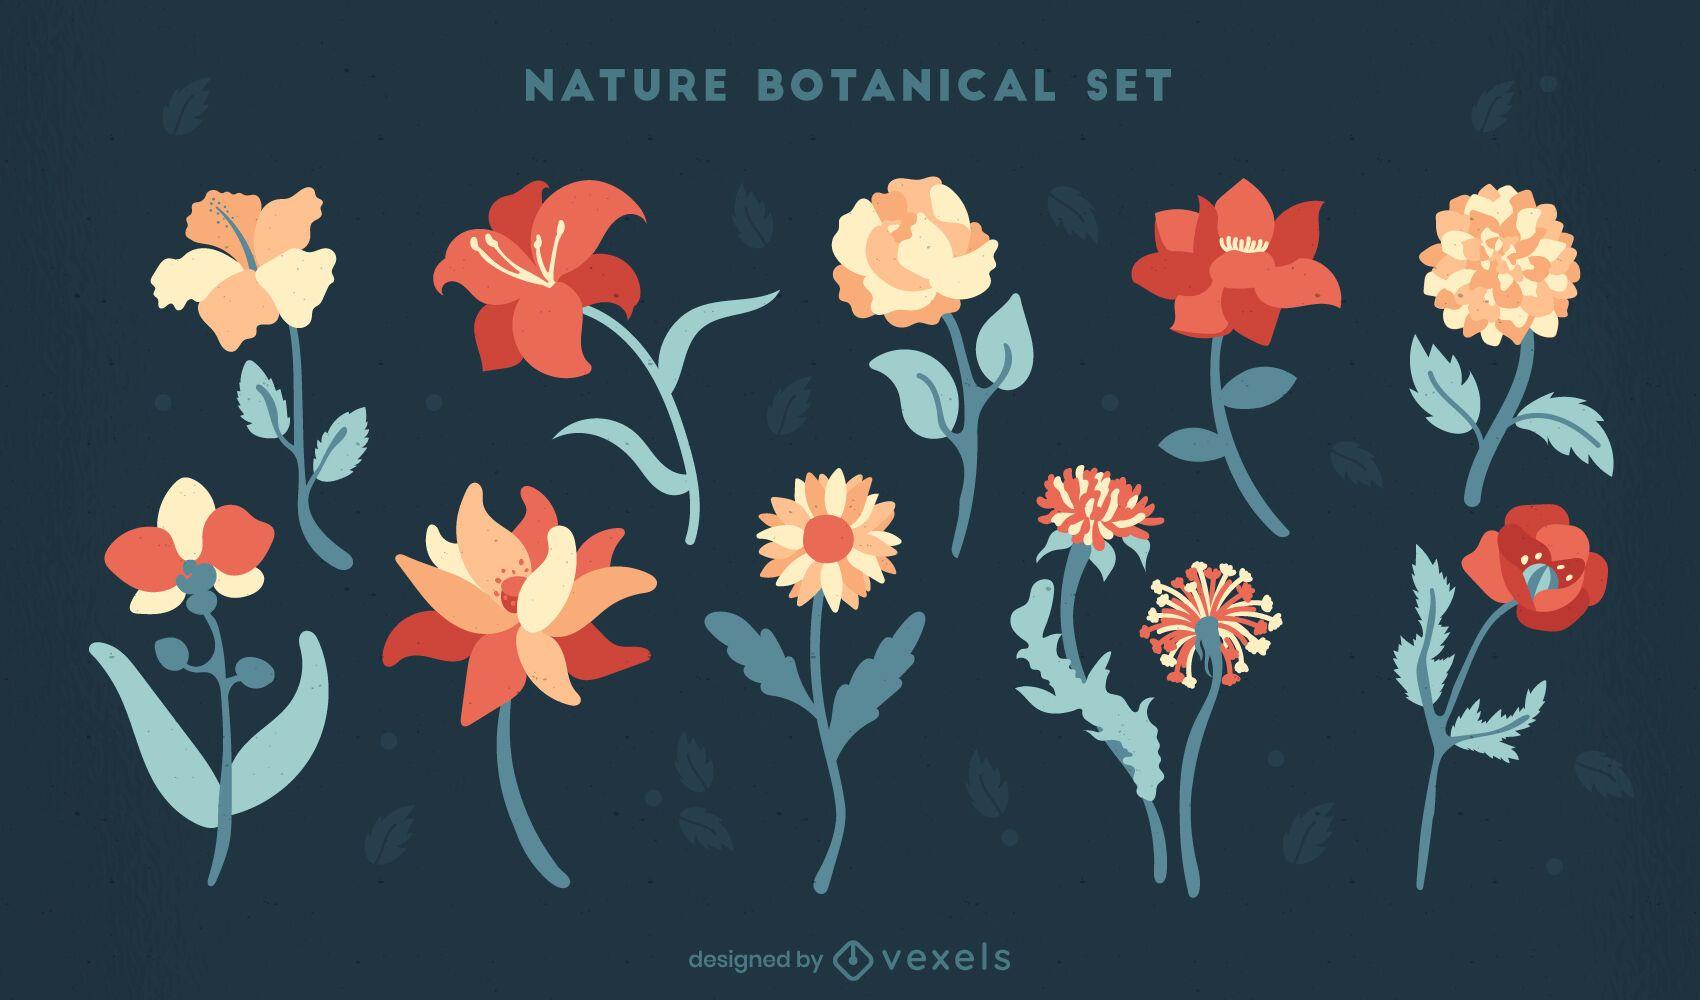 Flowers nature botanical garden set